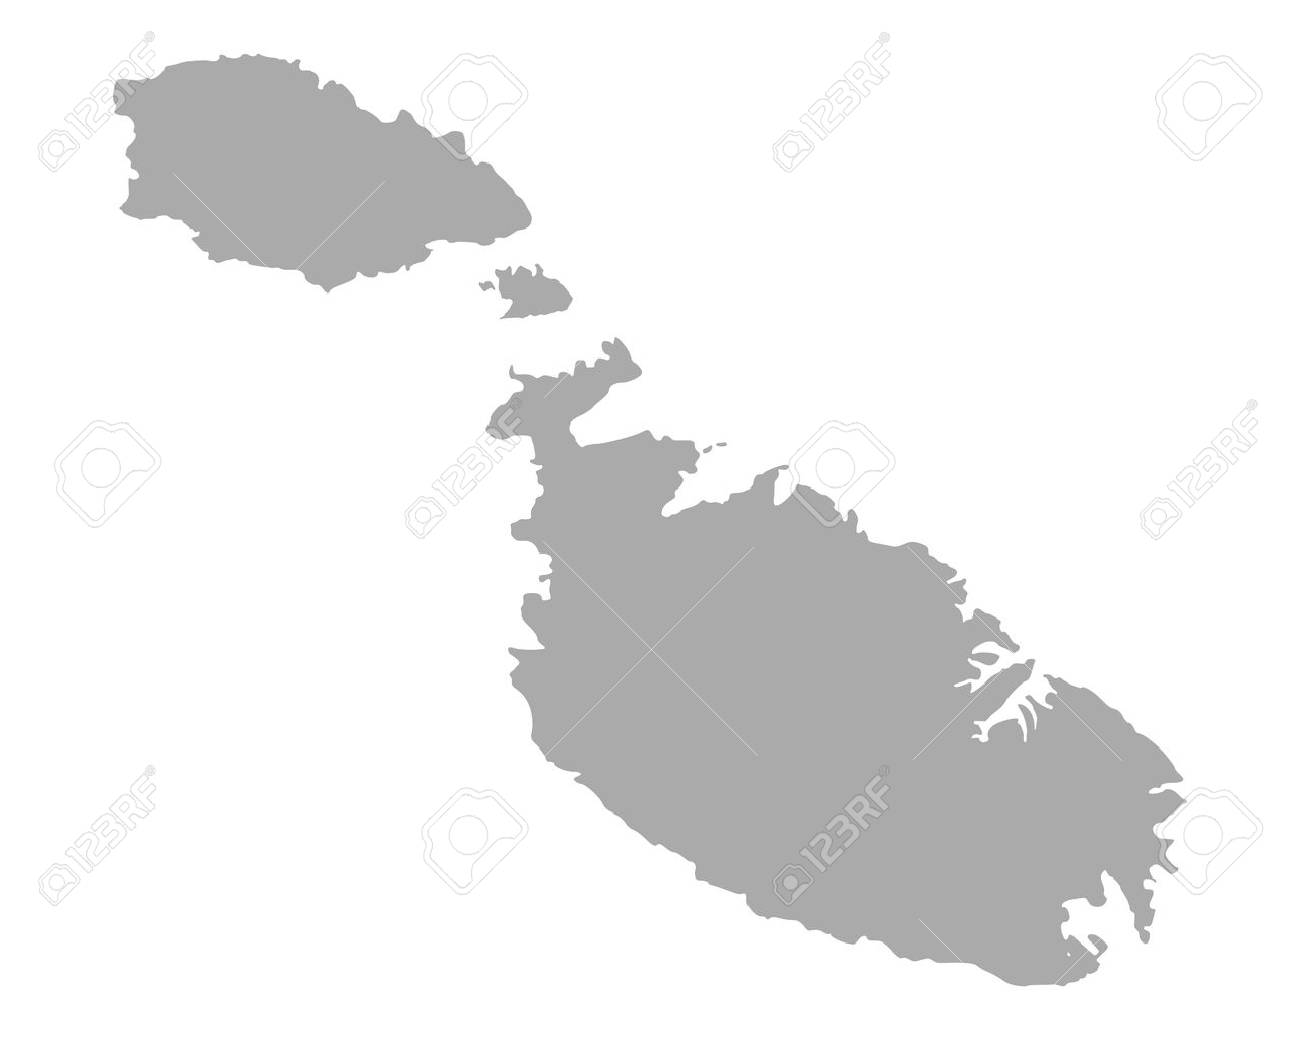 Map of Malta on white background, vector illustration. - 89013627